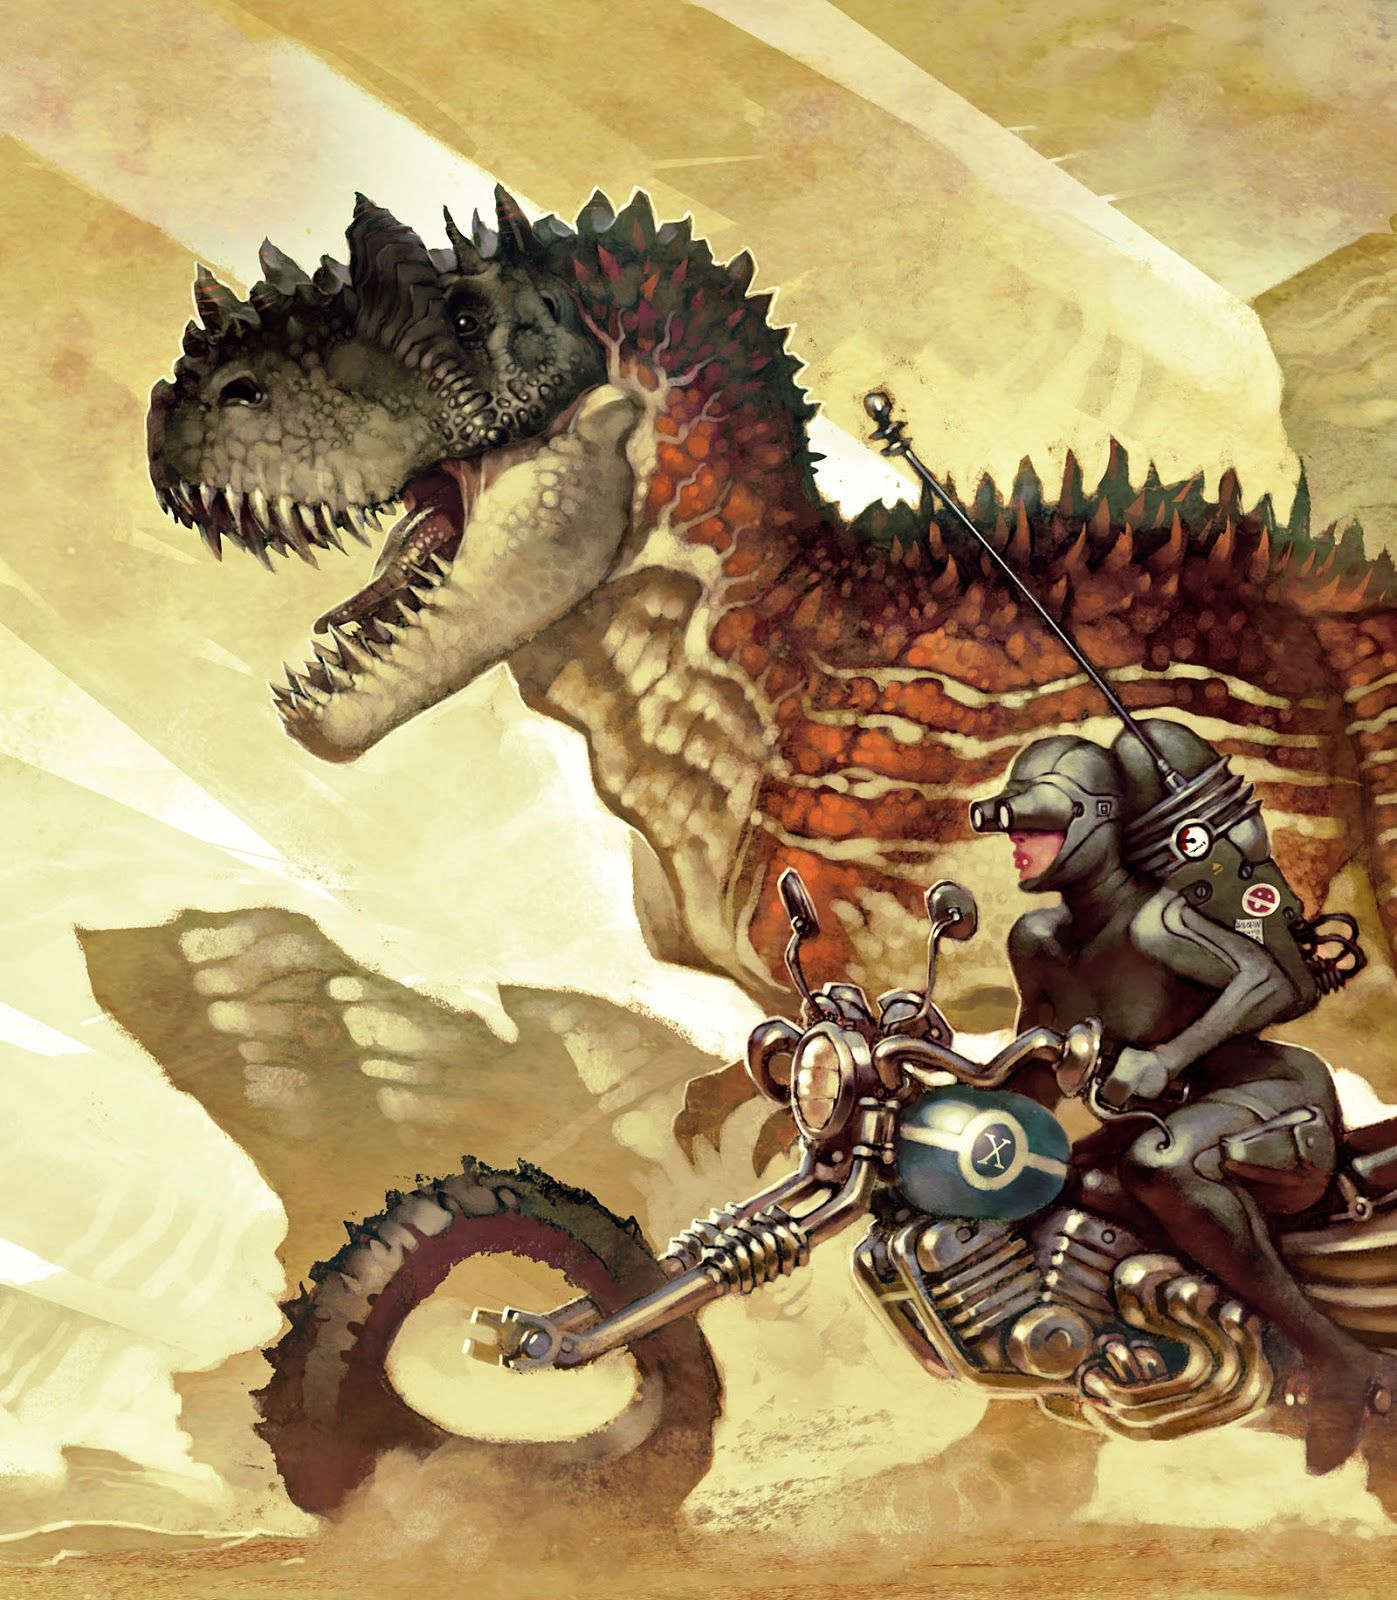 The King of Fatboss | Godzilla, Gojira, Illustration